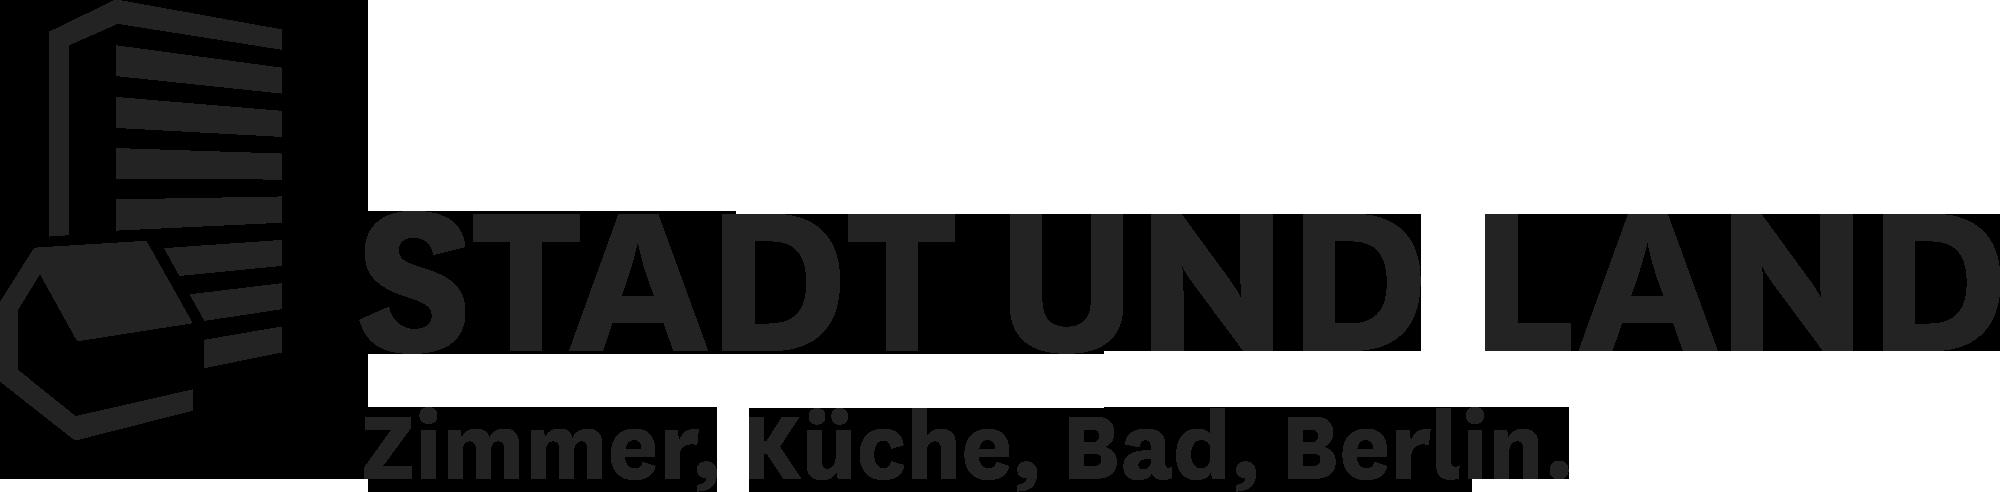 SUL_Logo-Unterzeile_bw